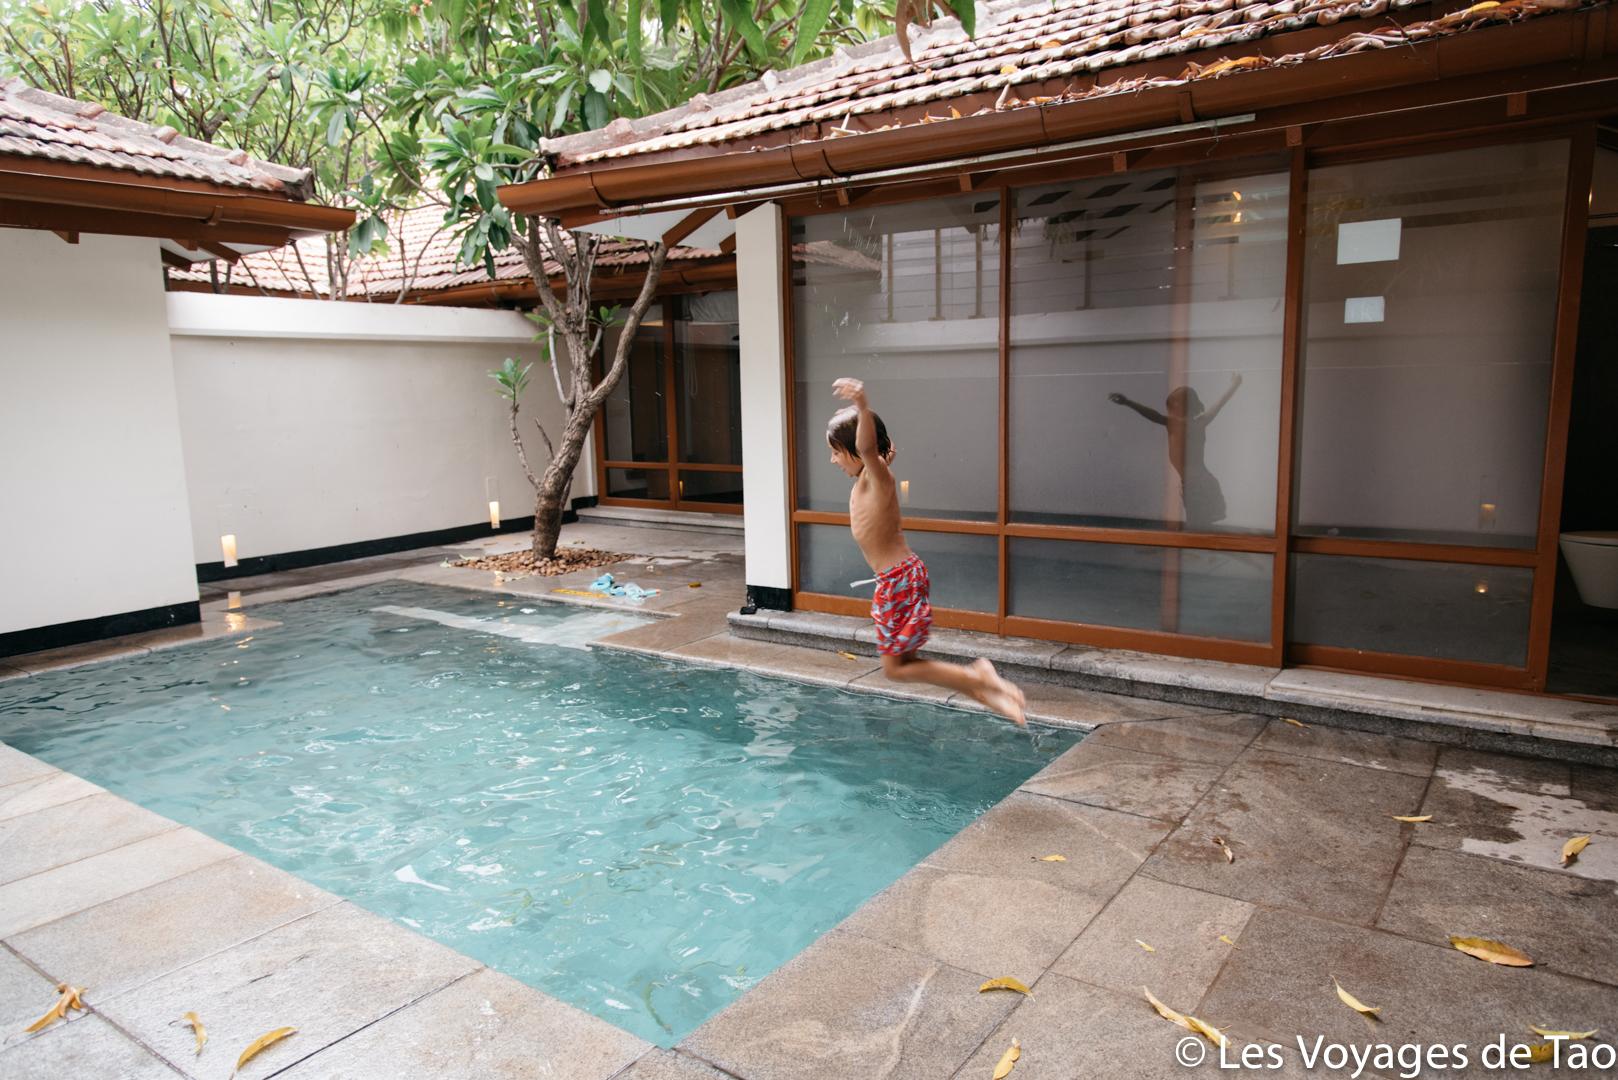 Hotel héritage madurai